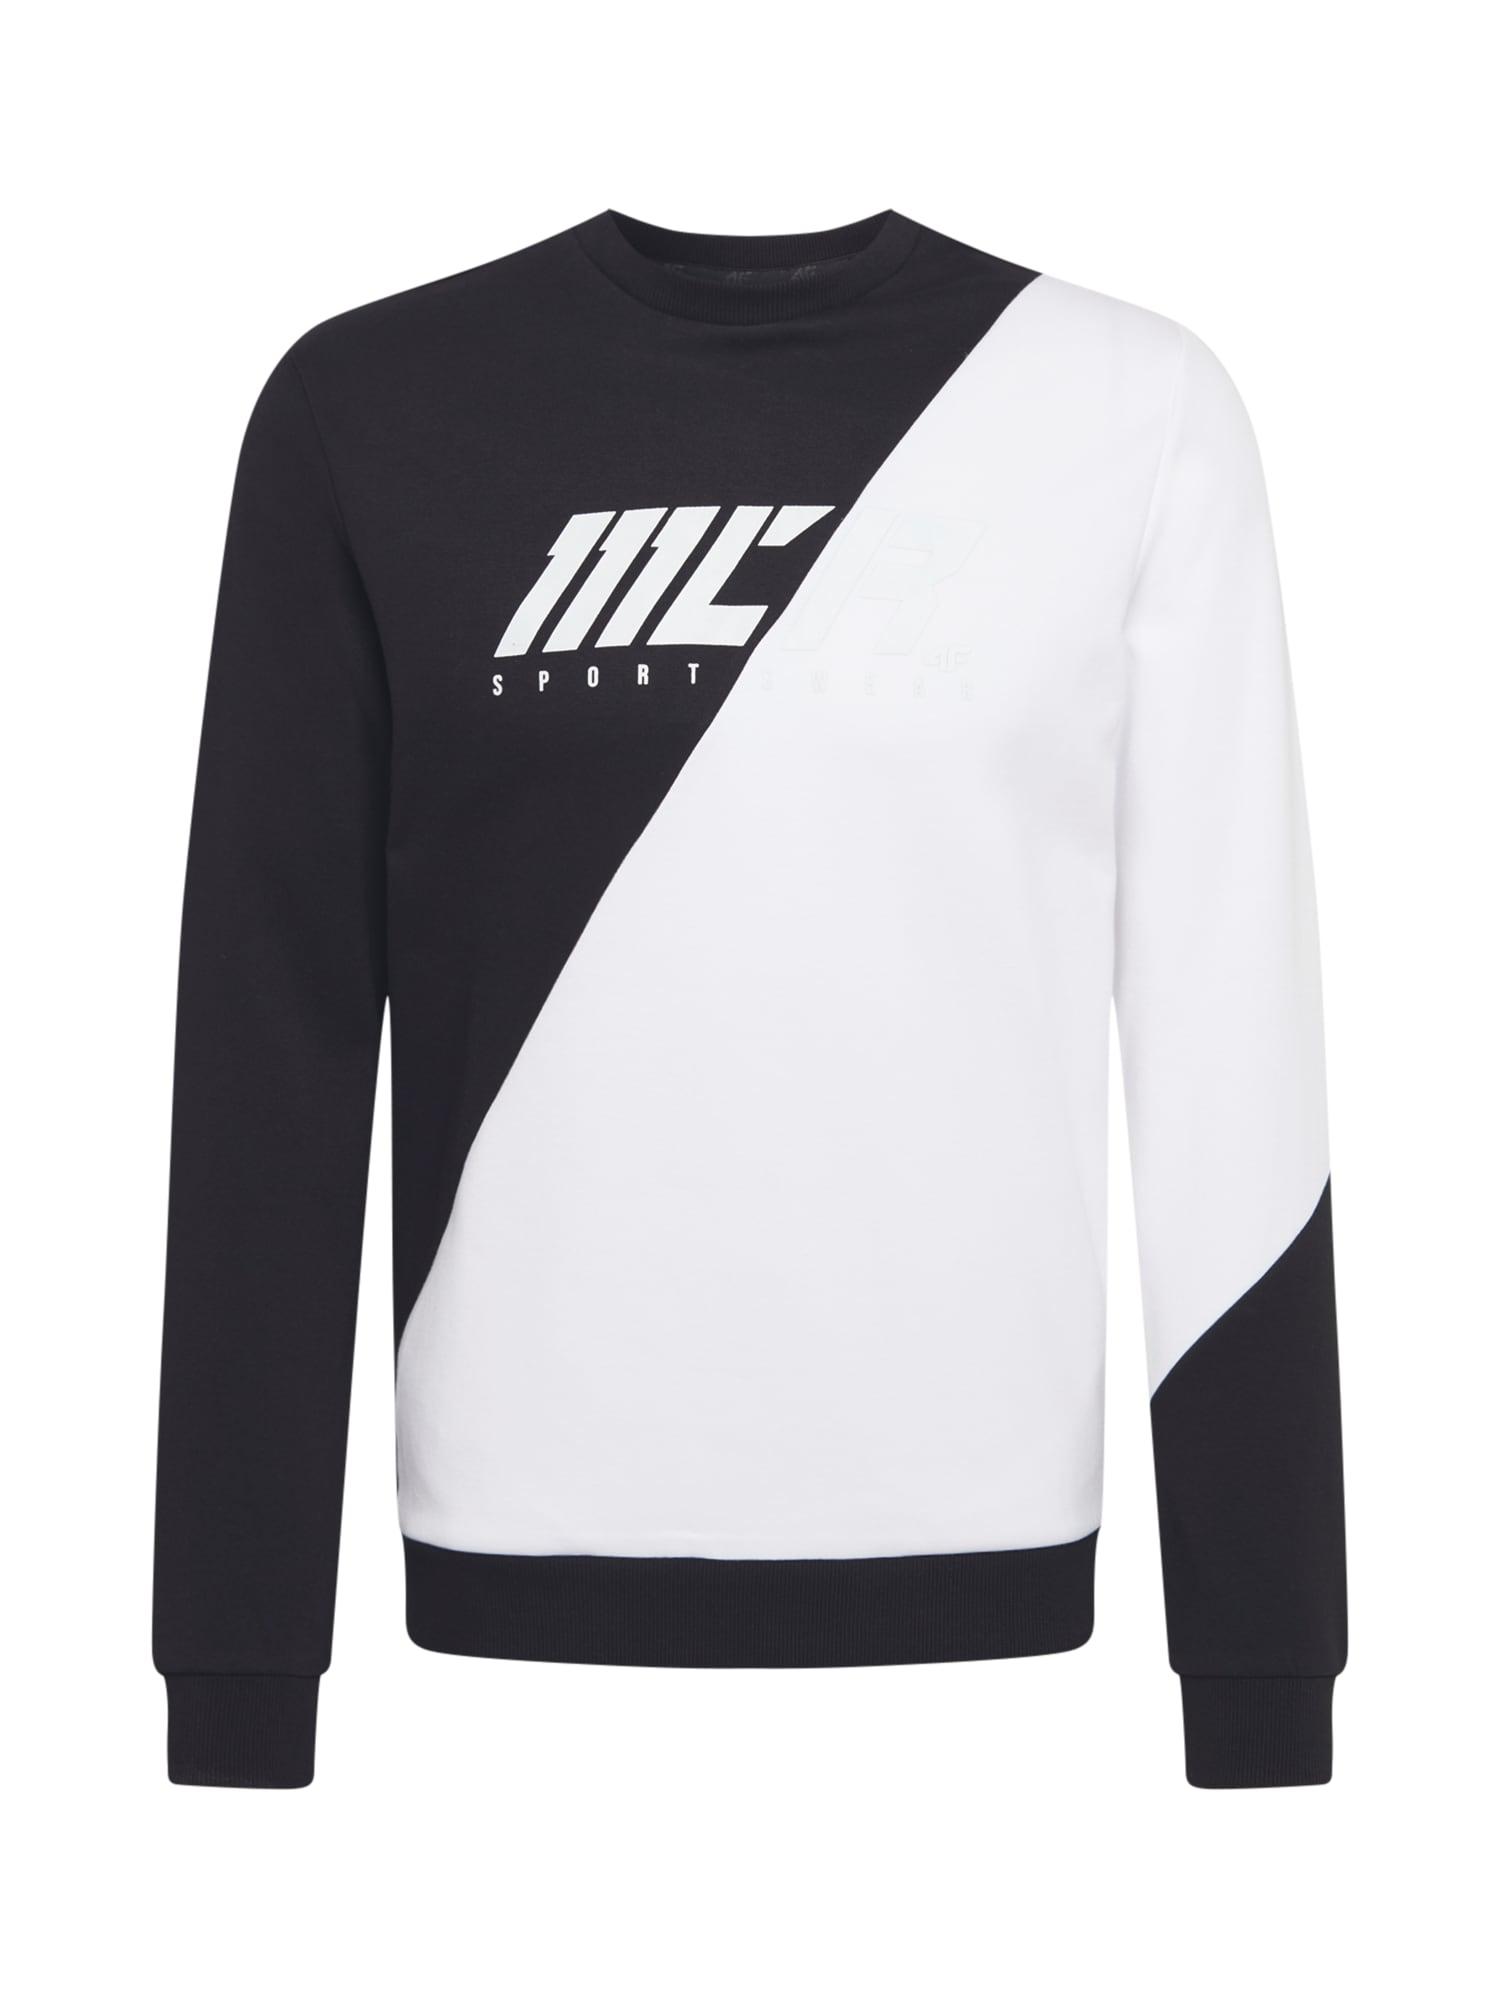 4F Sportinio tipo megztinis balta / juoda / pilka